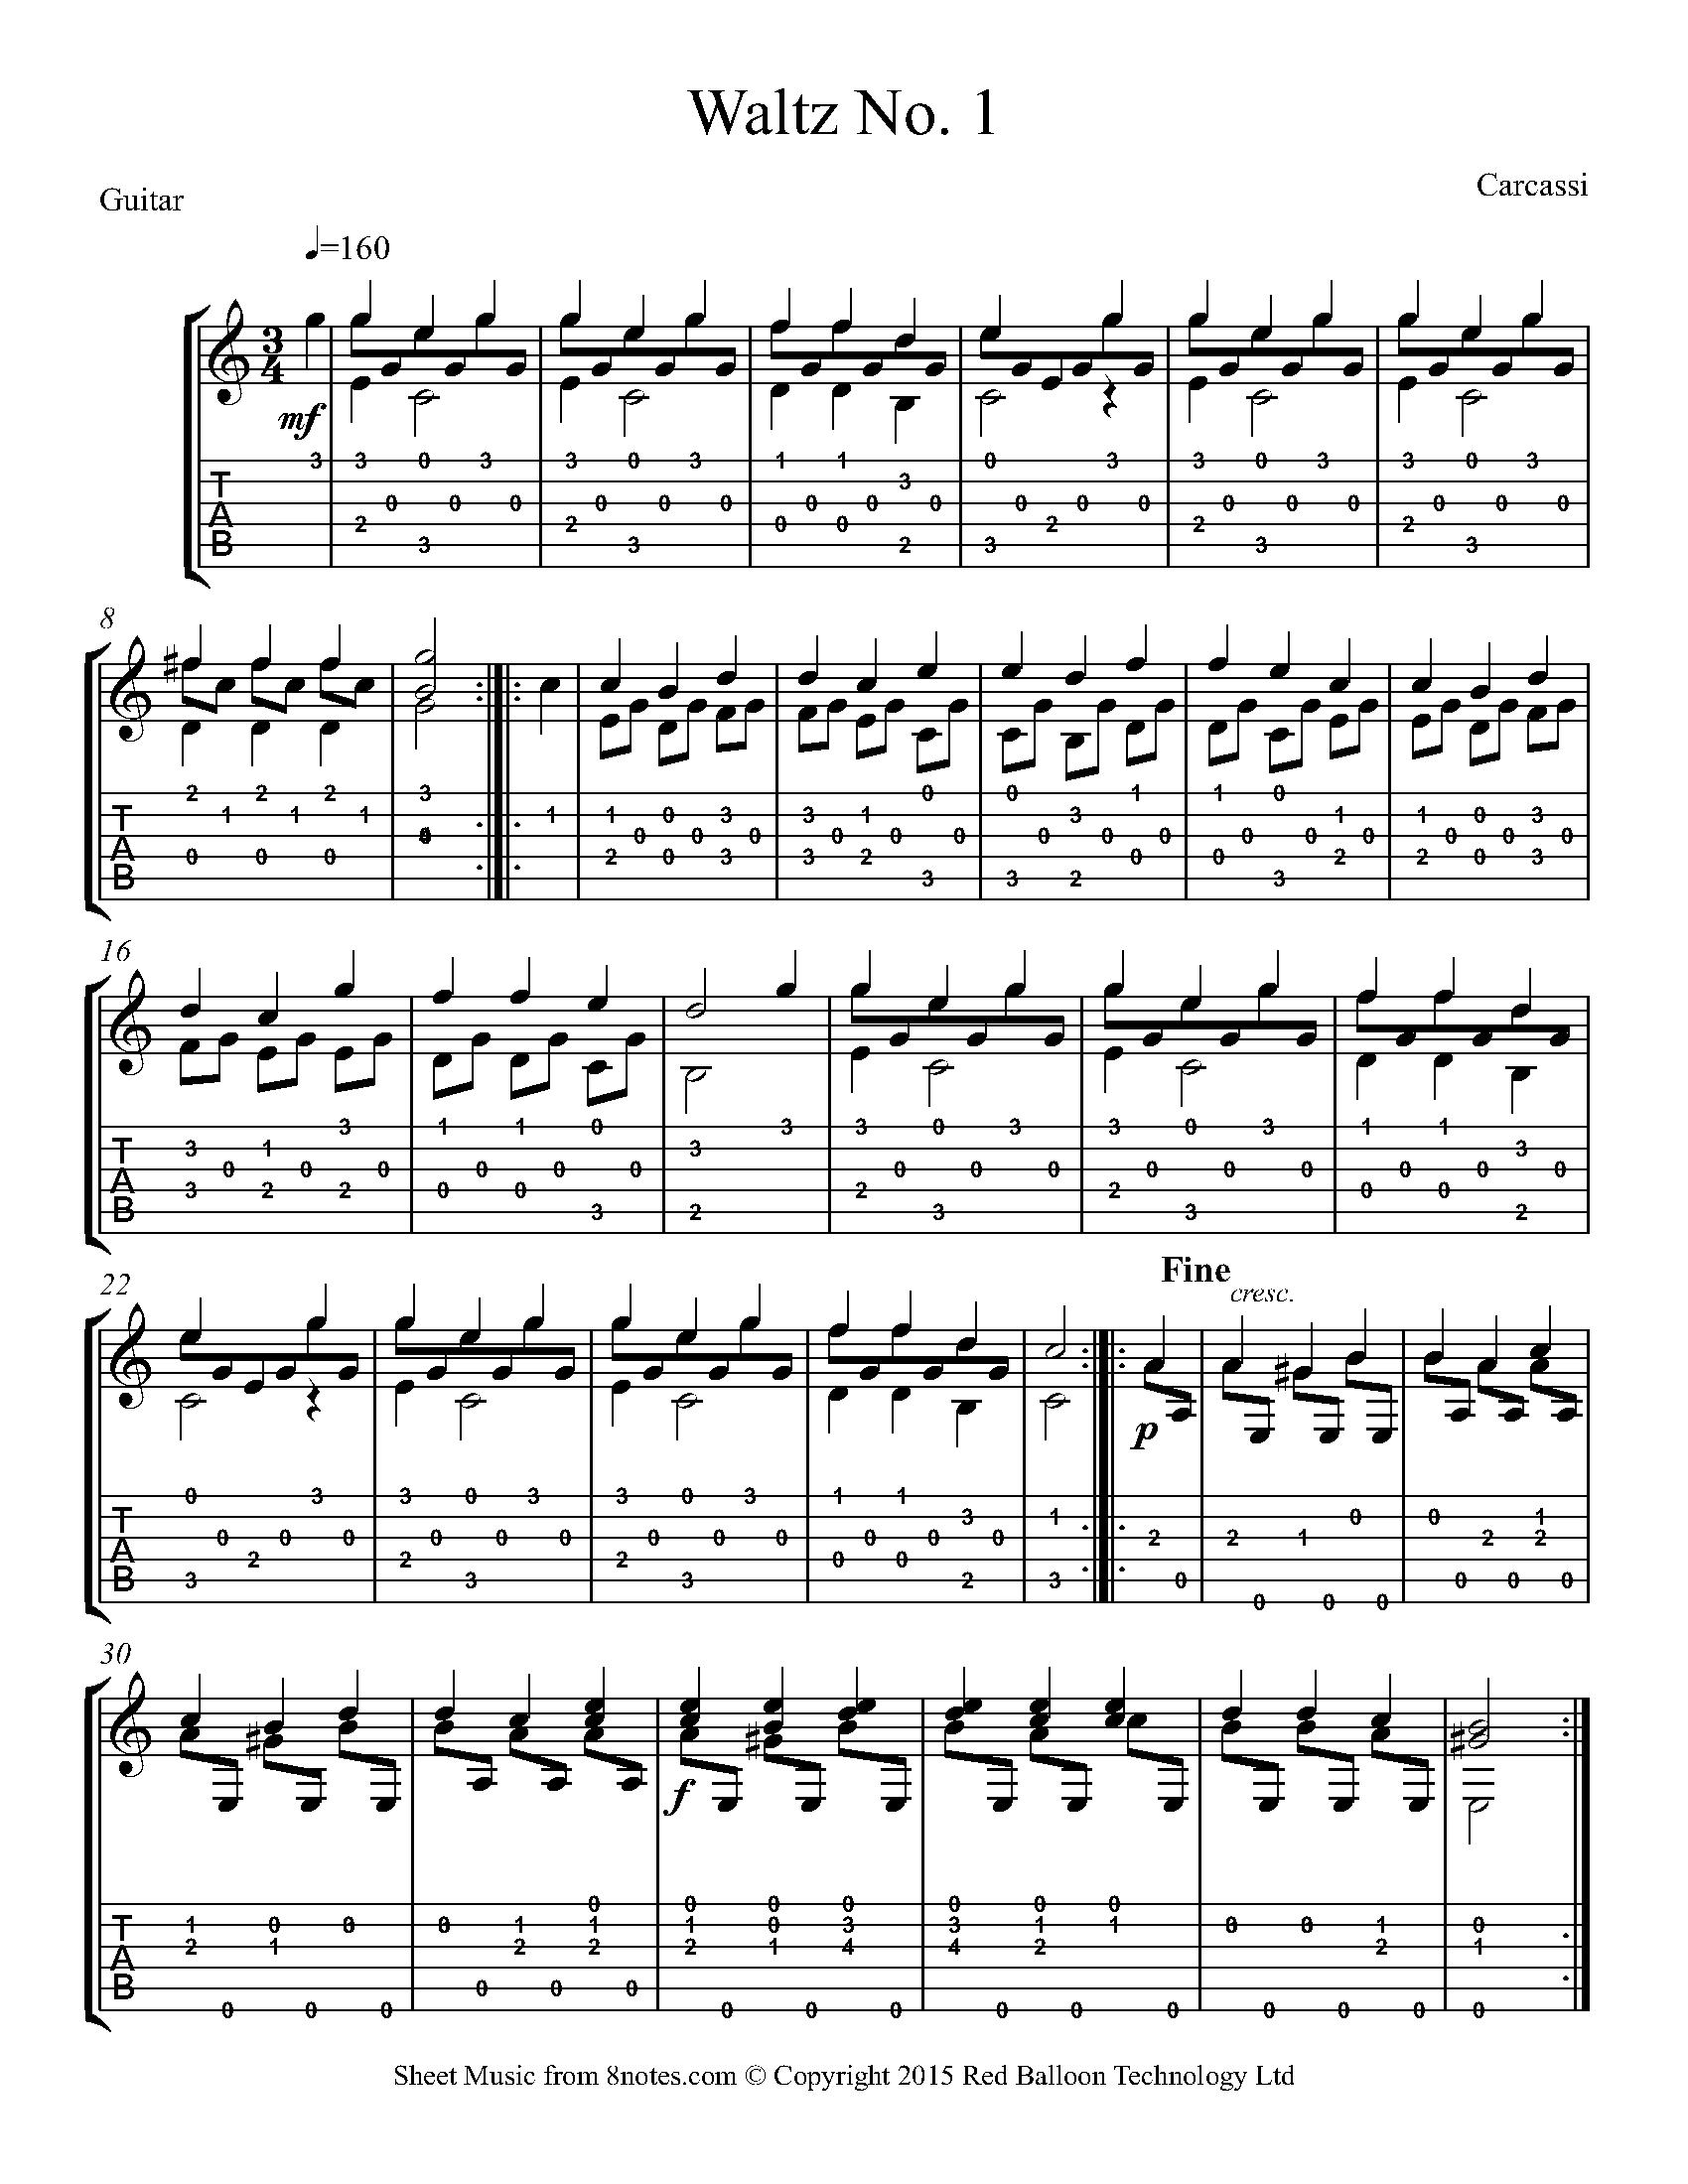 Free Guitar Sheet Music Lessons Resources 8notescom